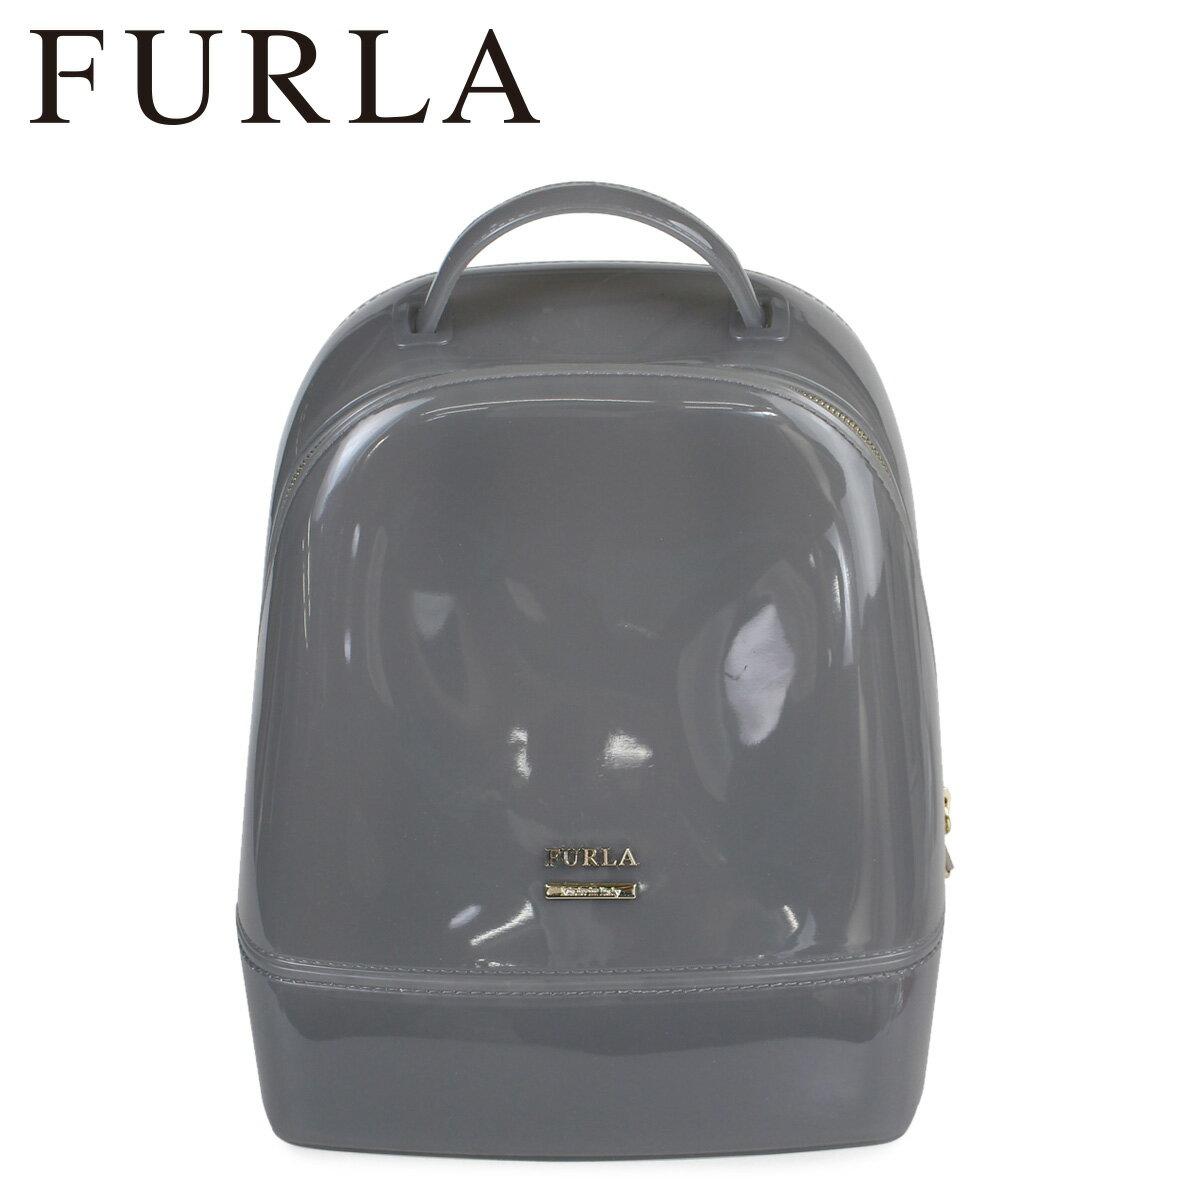 FURLA CANDY S BACK PACK RPSA フルラ バッグ リュック バックパック レディース グレー 885219 [12/26 新入荷]